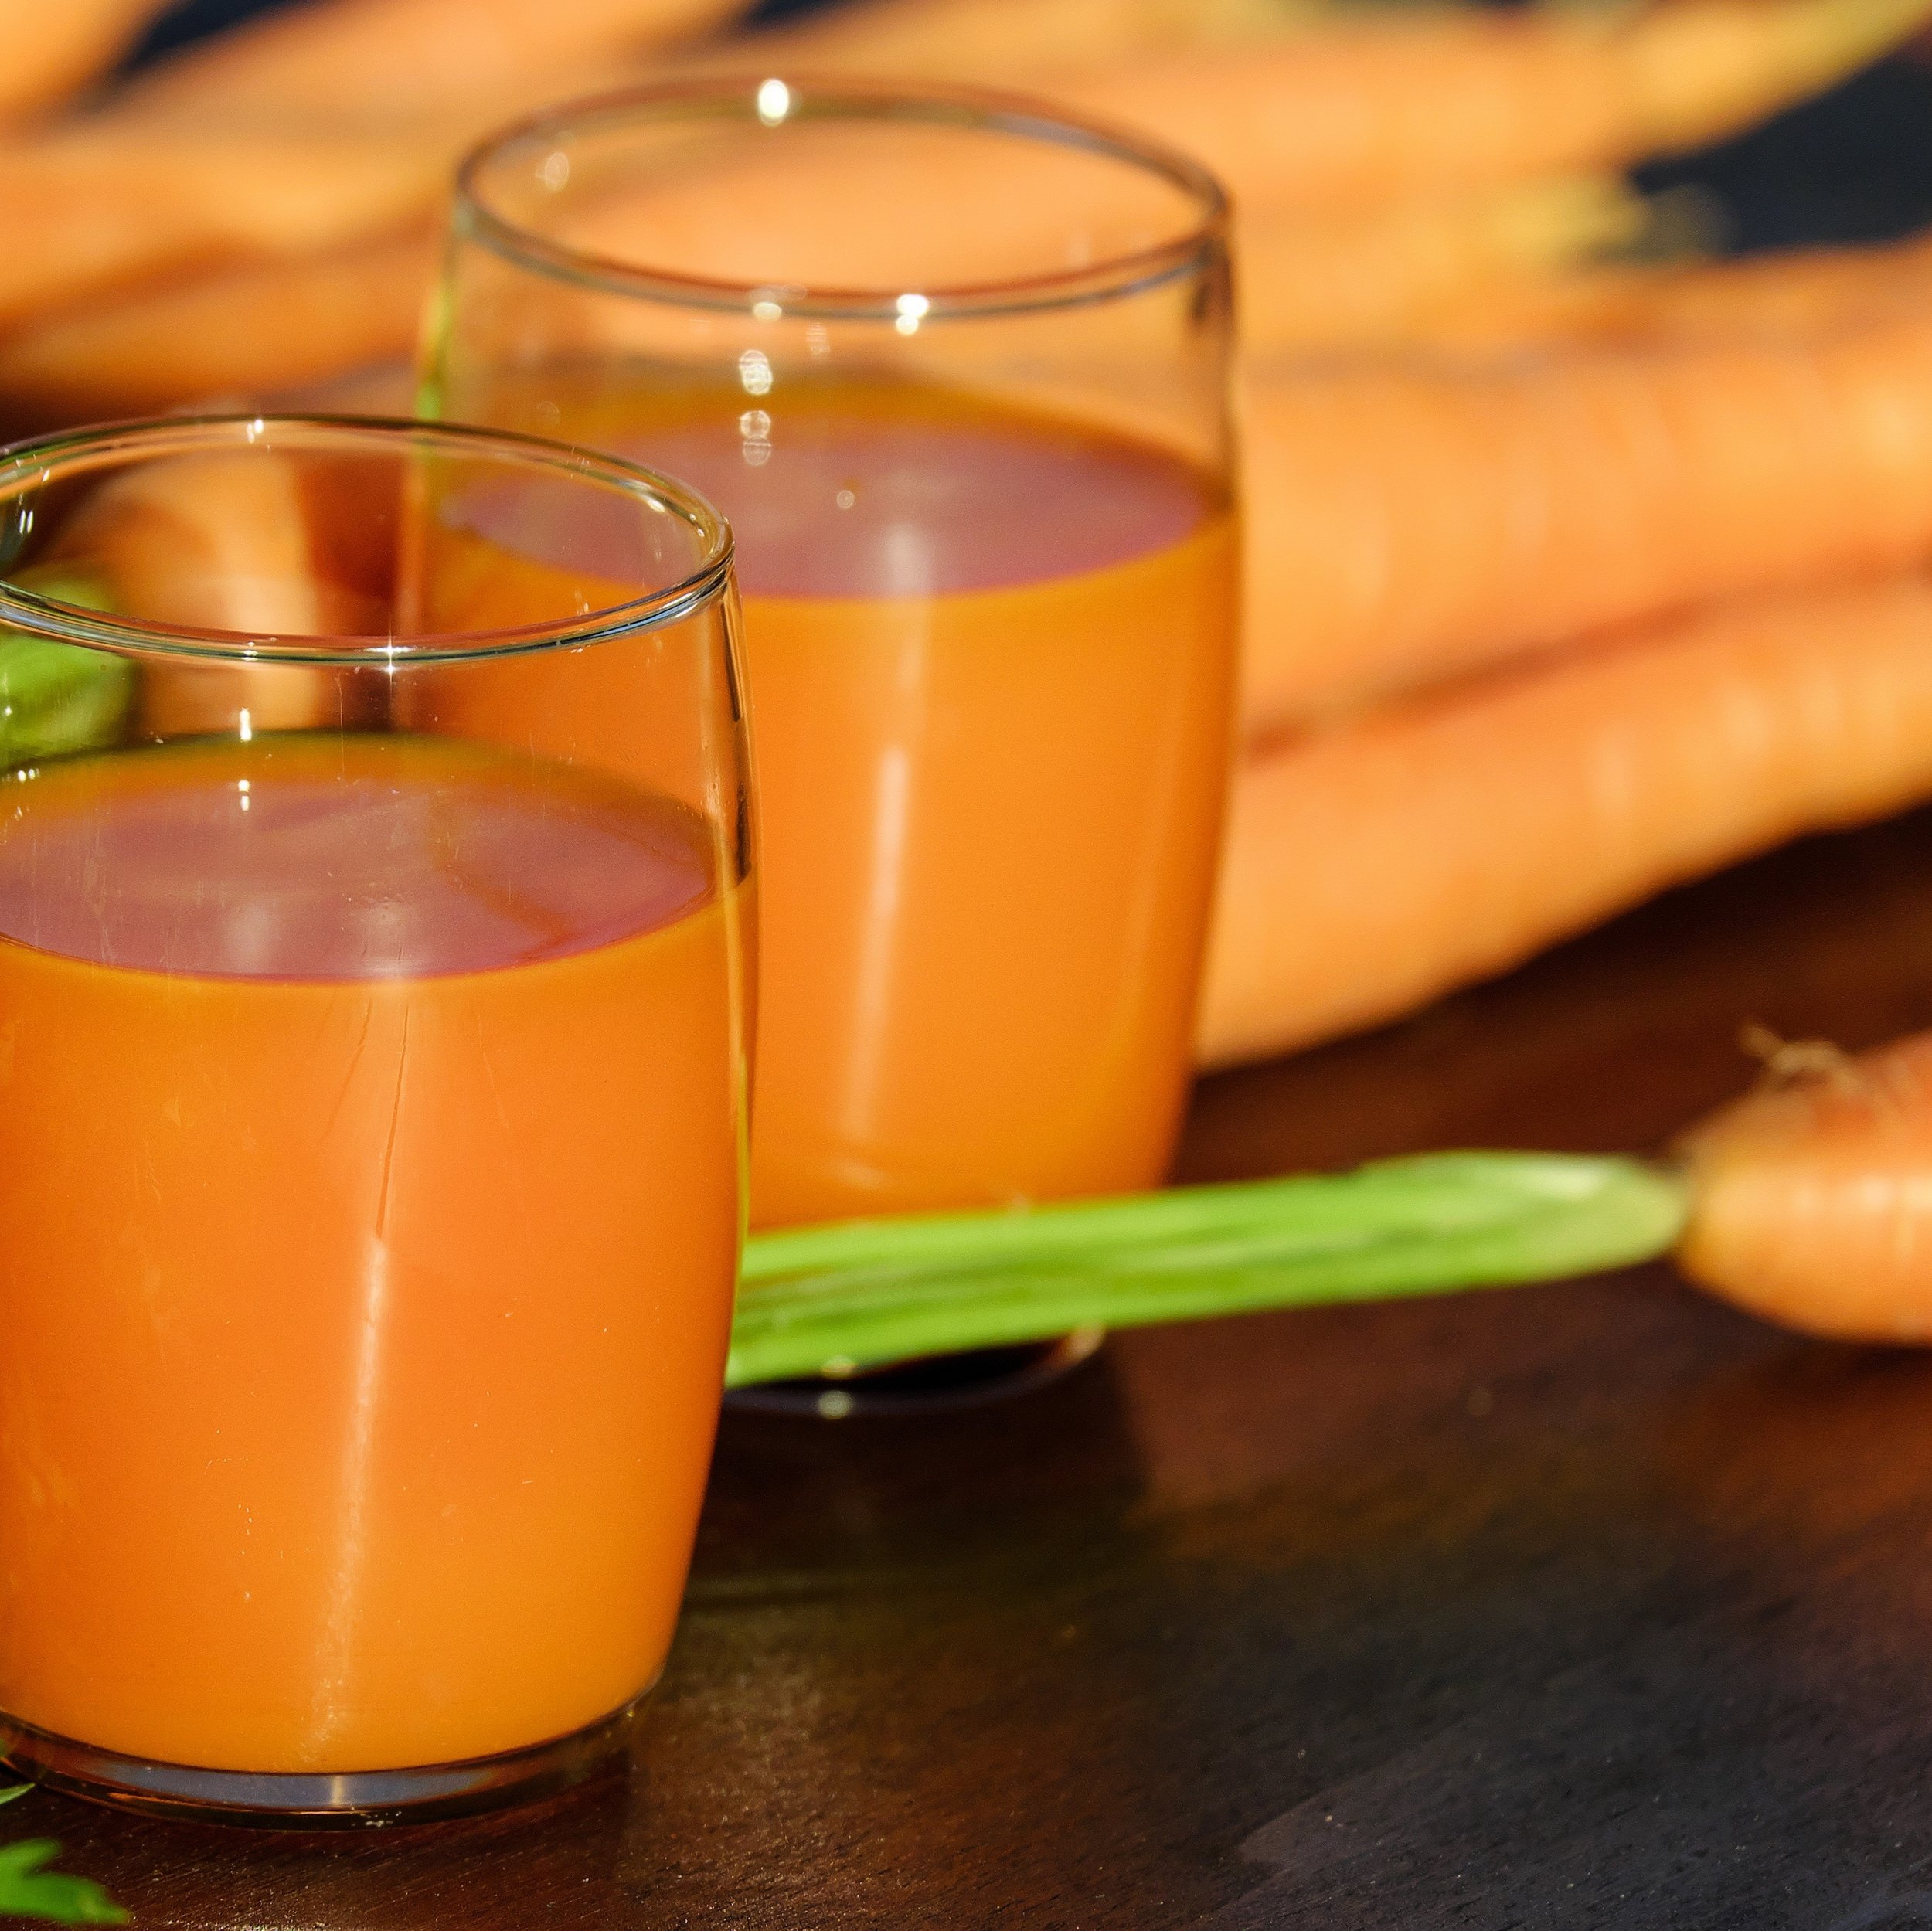 carrot-juice-juice-carrots-vegetable-juice-162669.jpeg